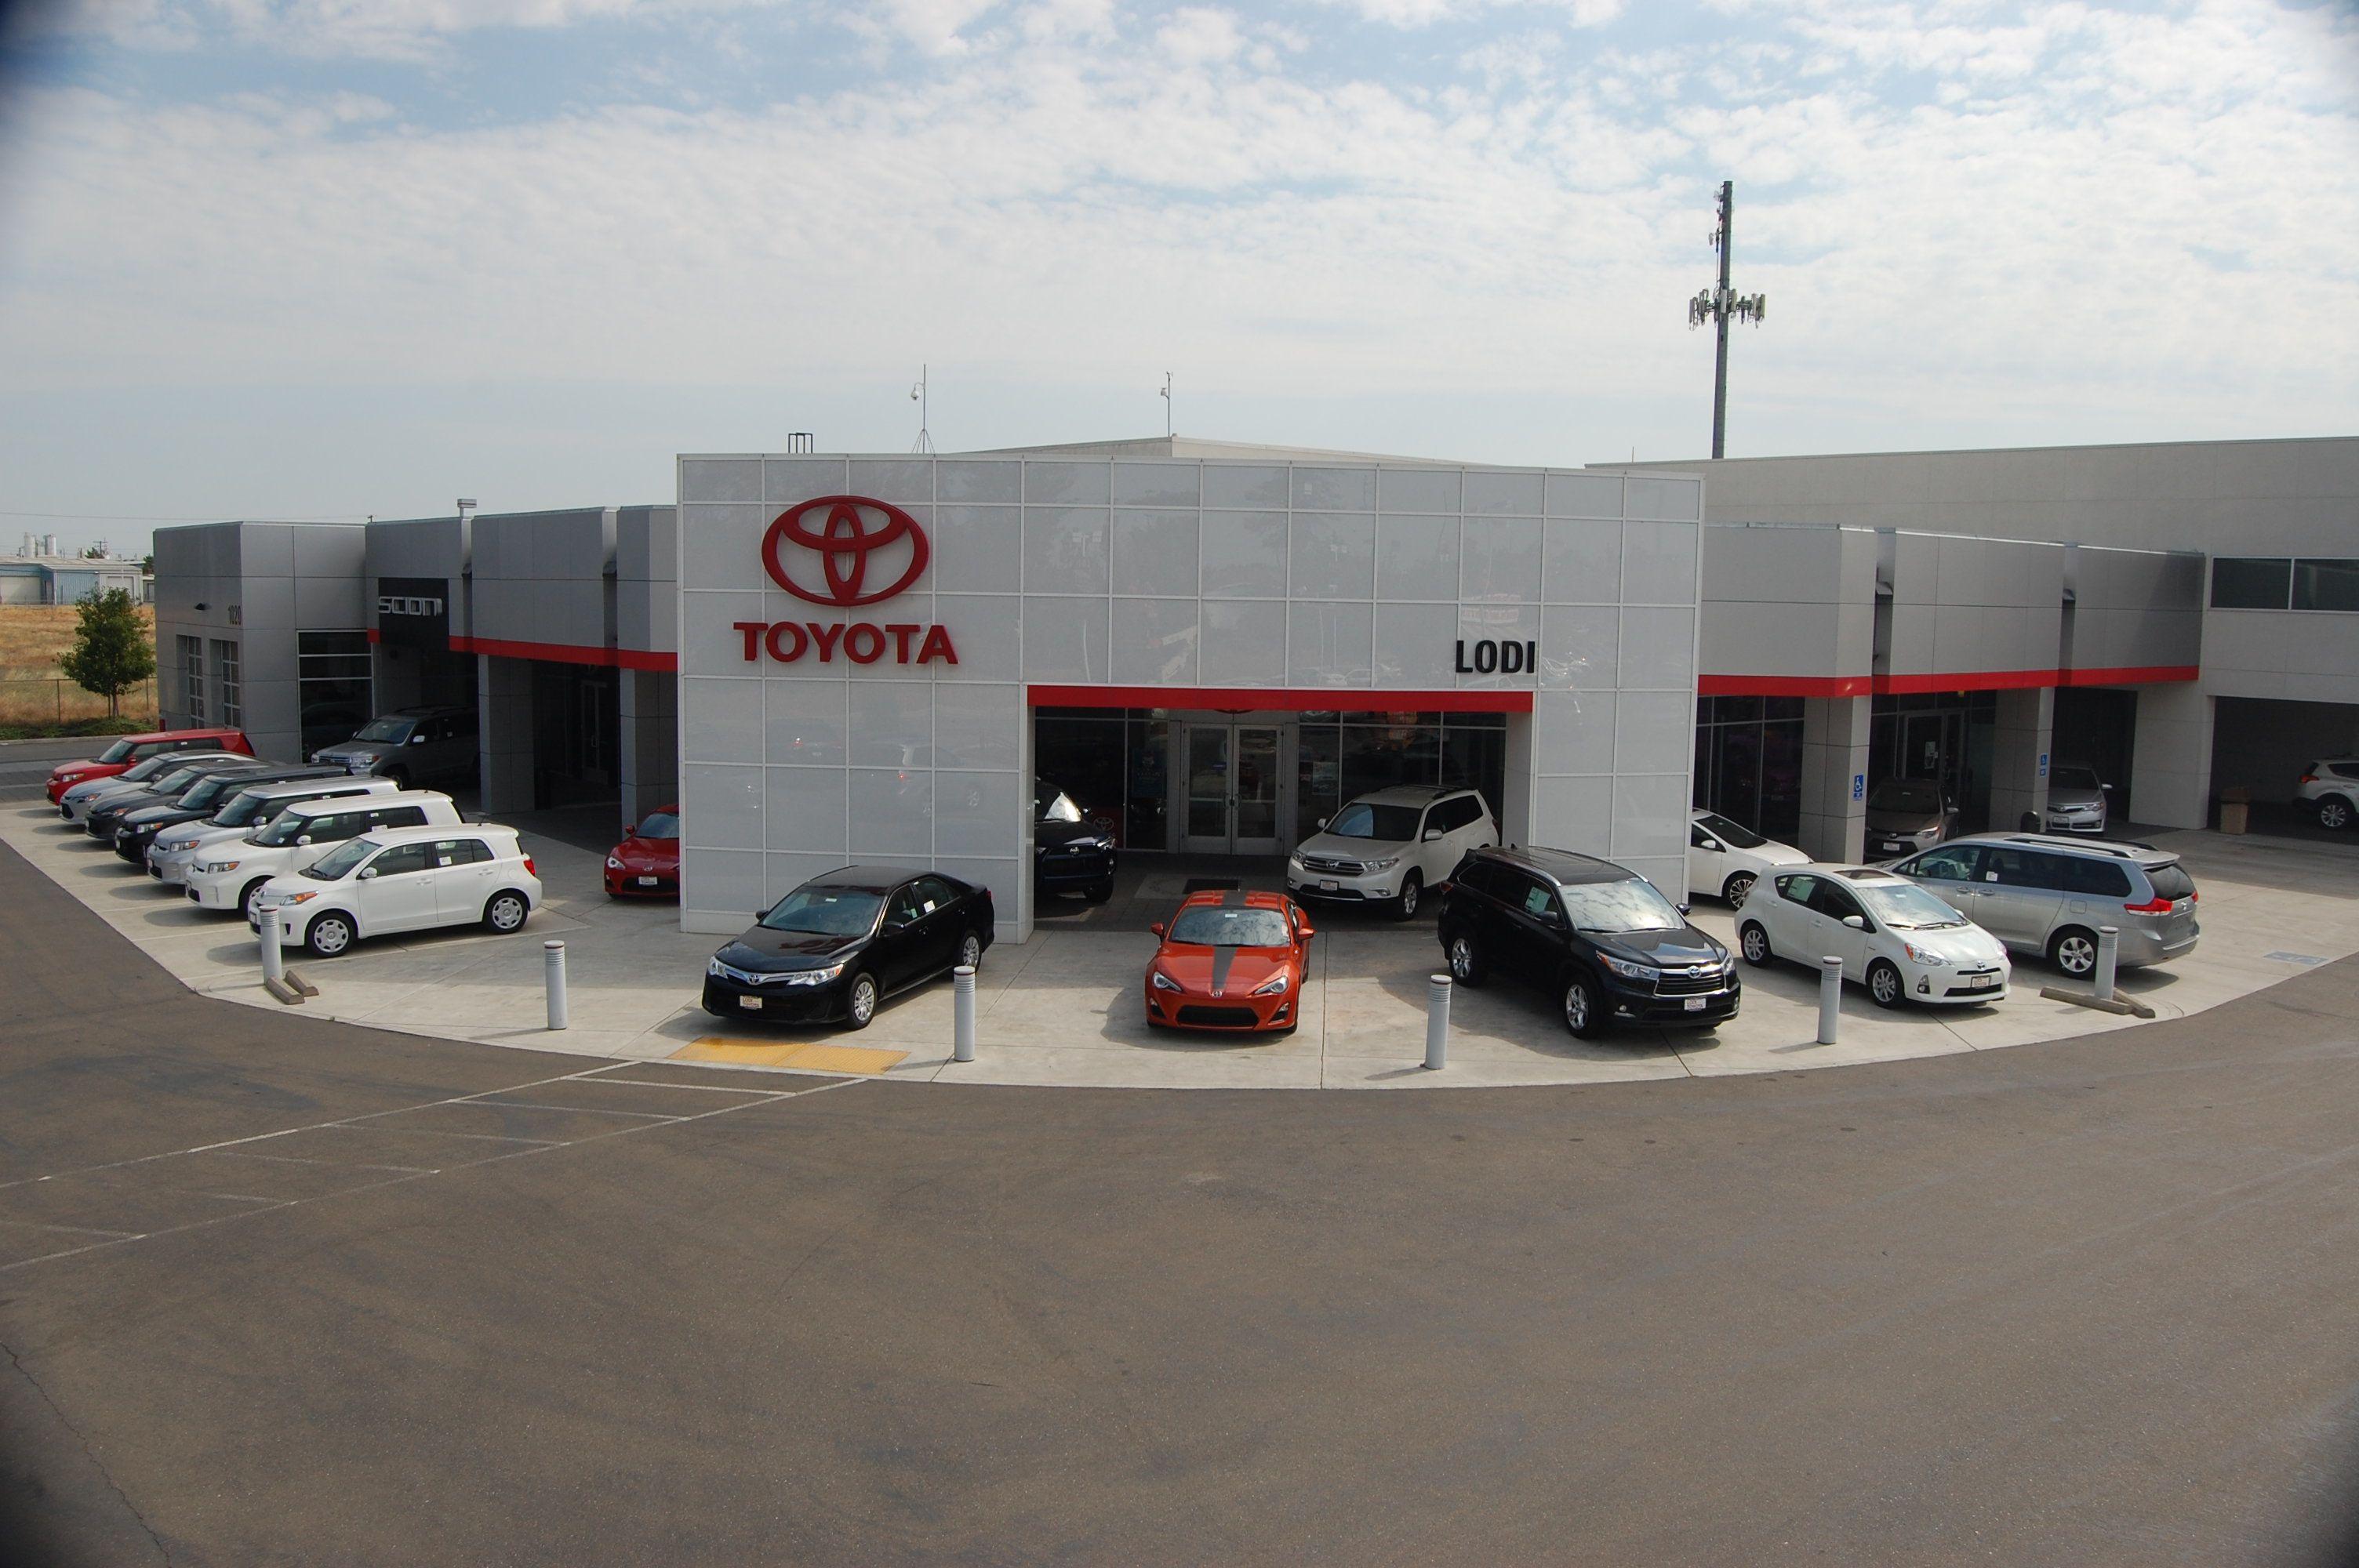 al gas ezgo prices dodge sale for dothan pa dealership car golf in gasoline txt cart new reviews